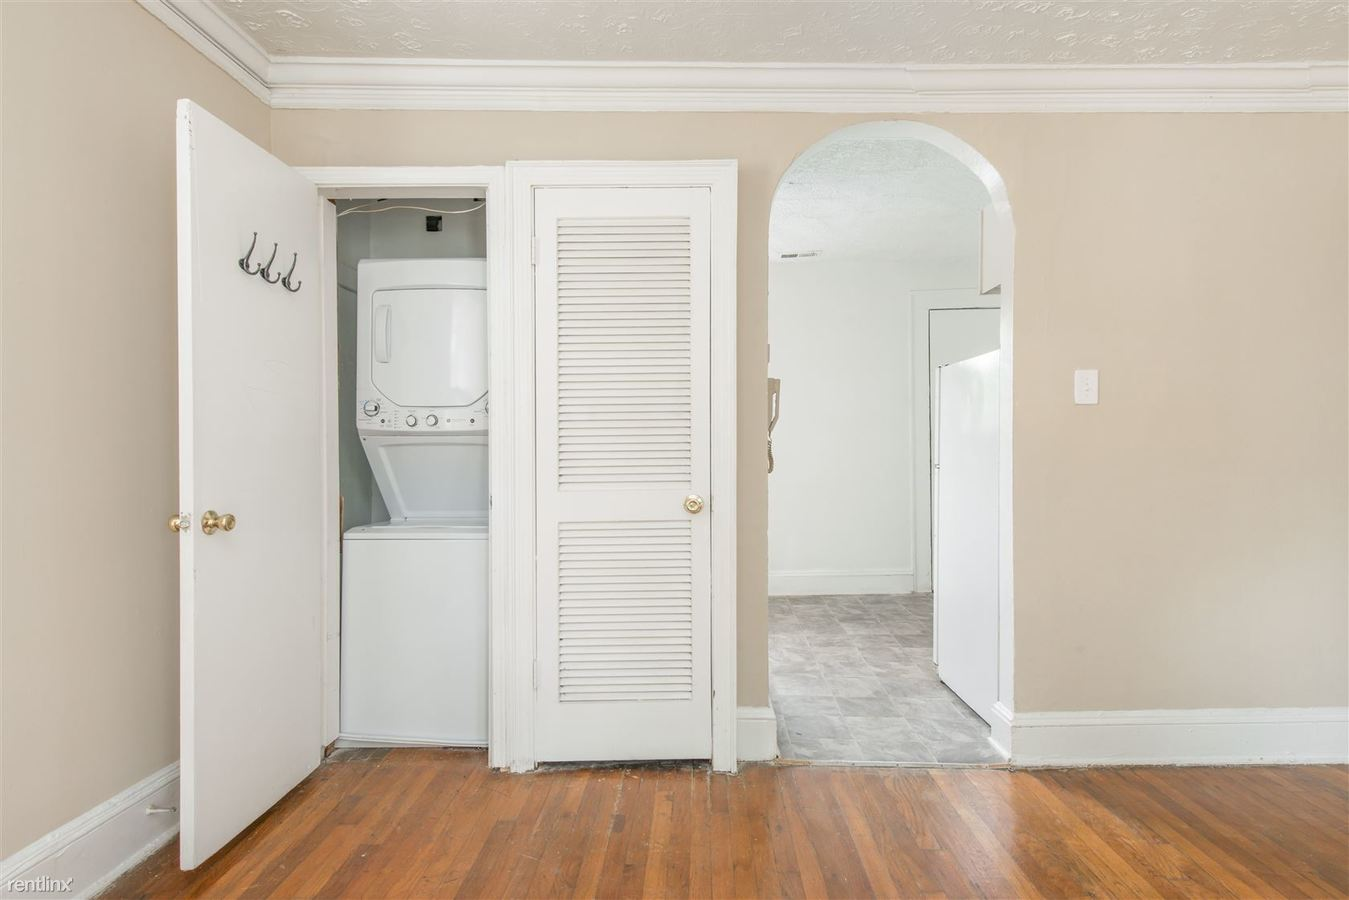 1 Bedroom 1 Bathroom Apartment for rent at Spanish Oaks in Atlanta, GA